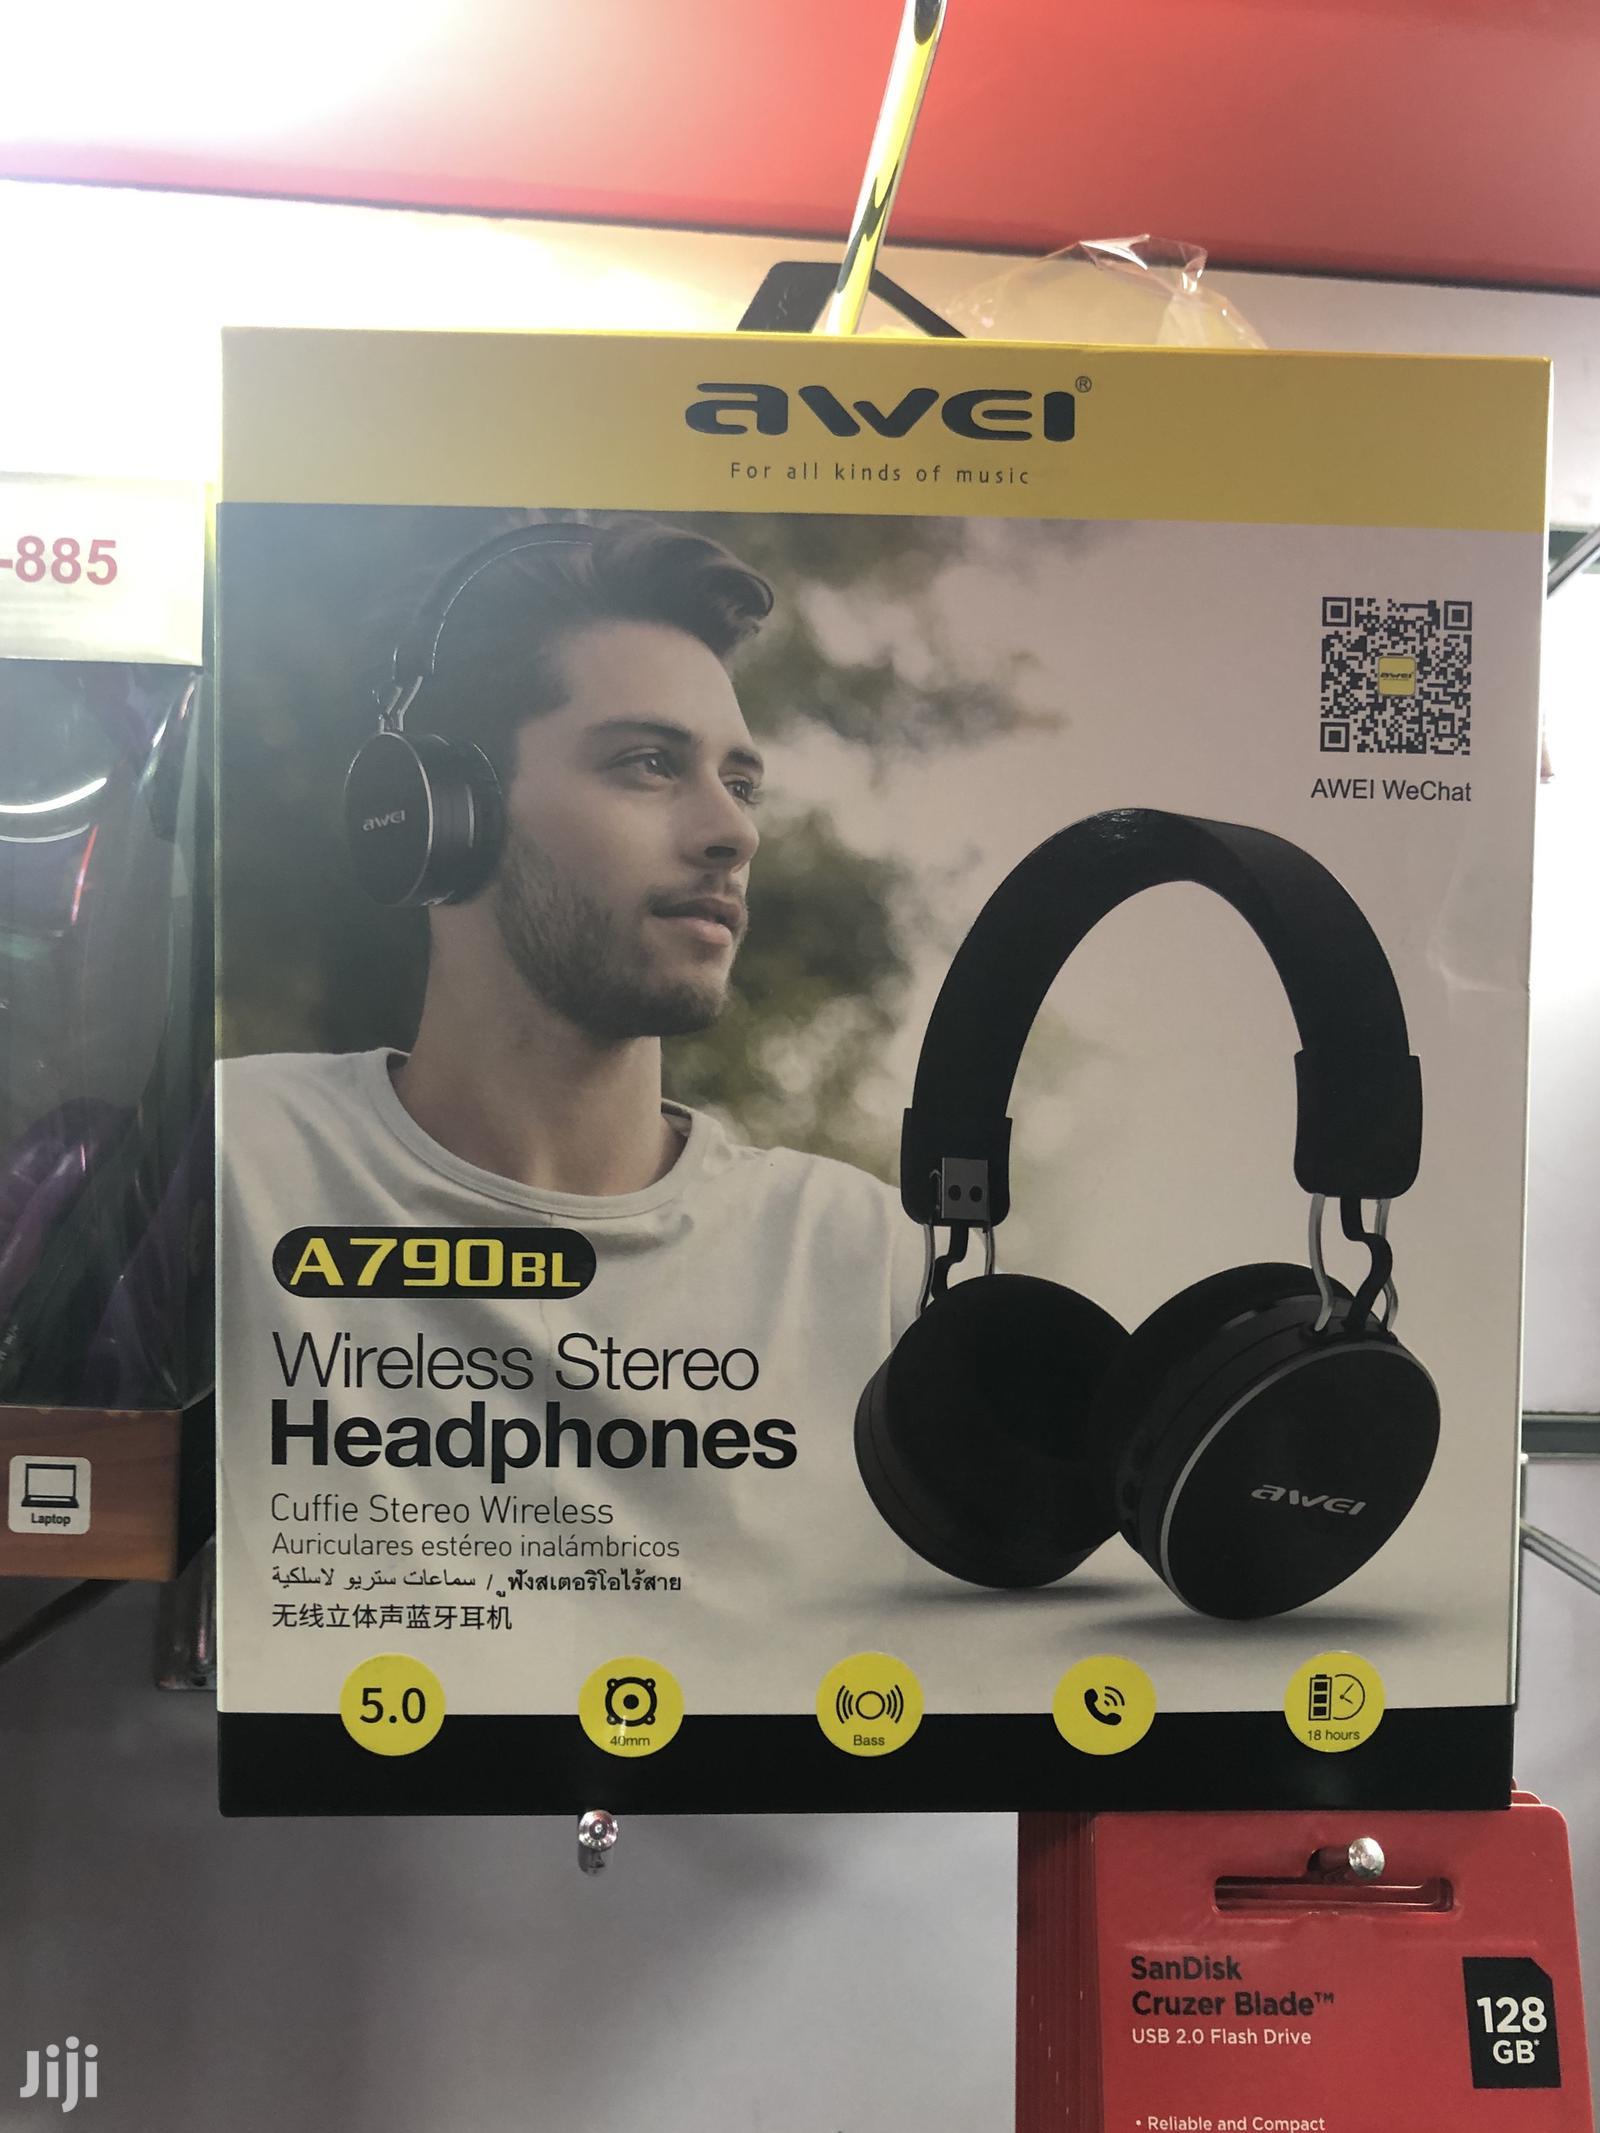 Awei Bluetooth Headphone A790 Bl